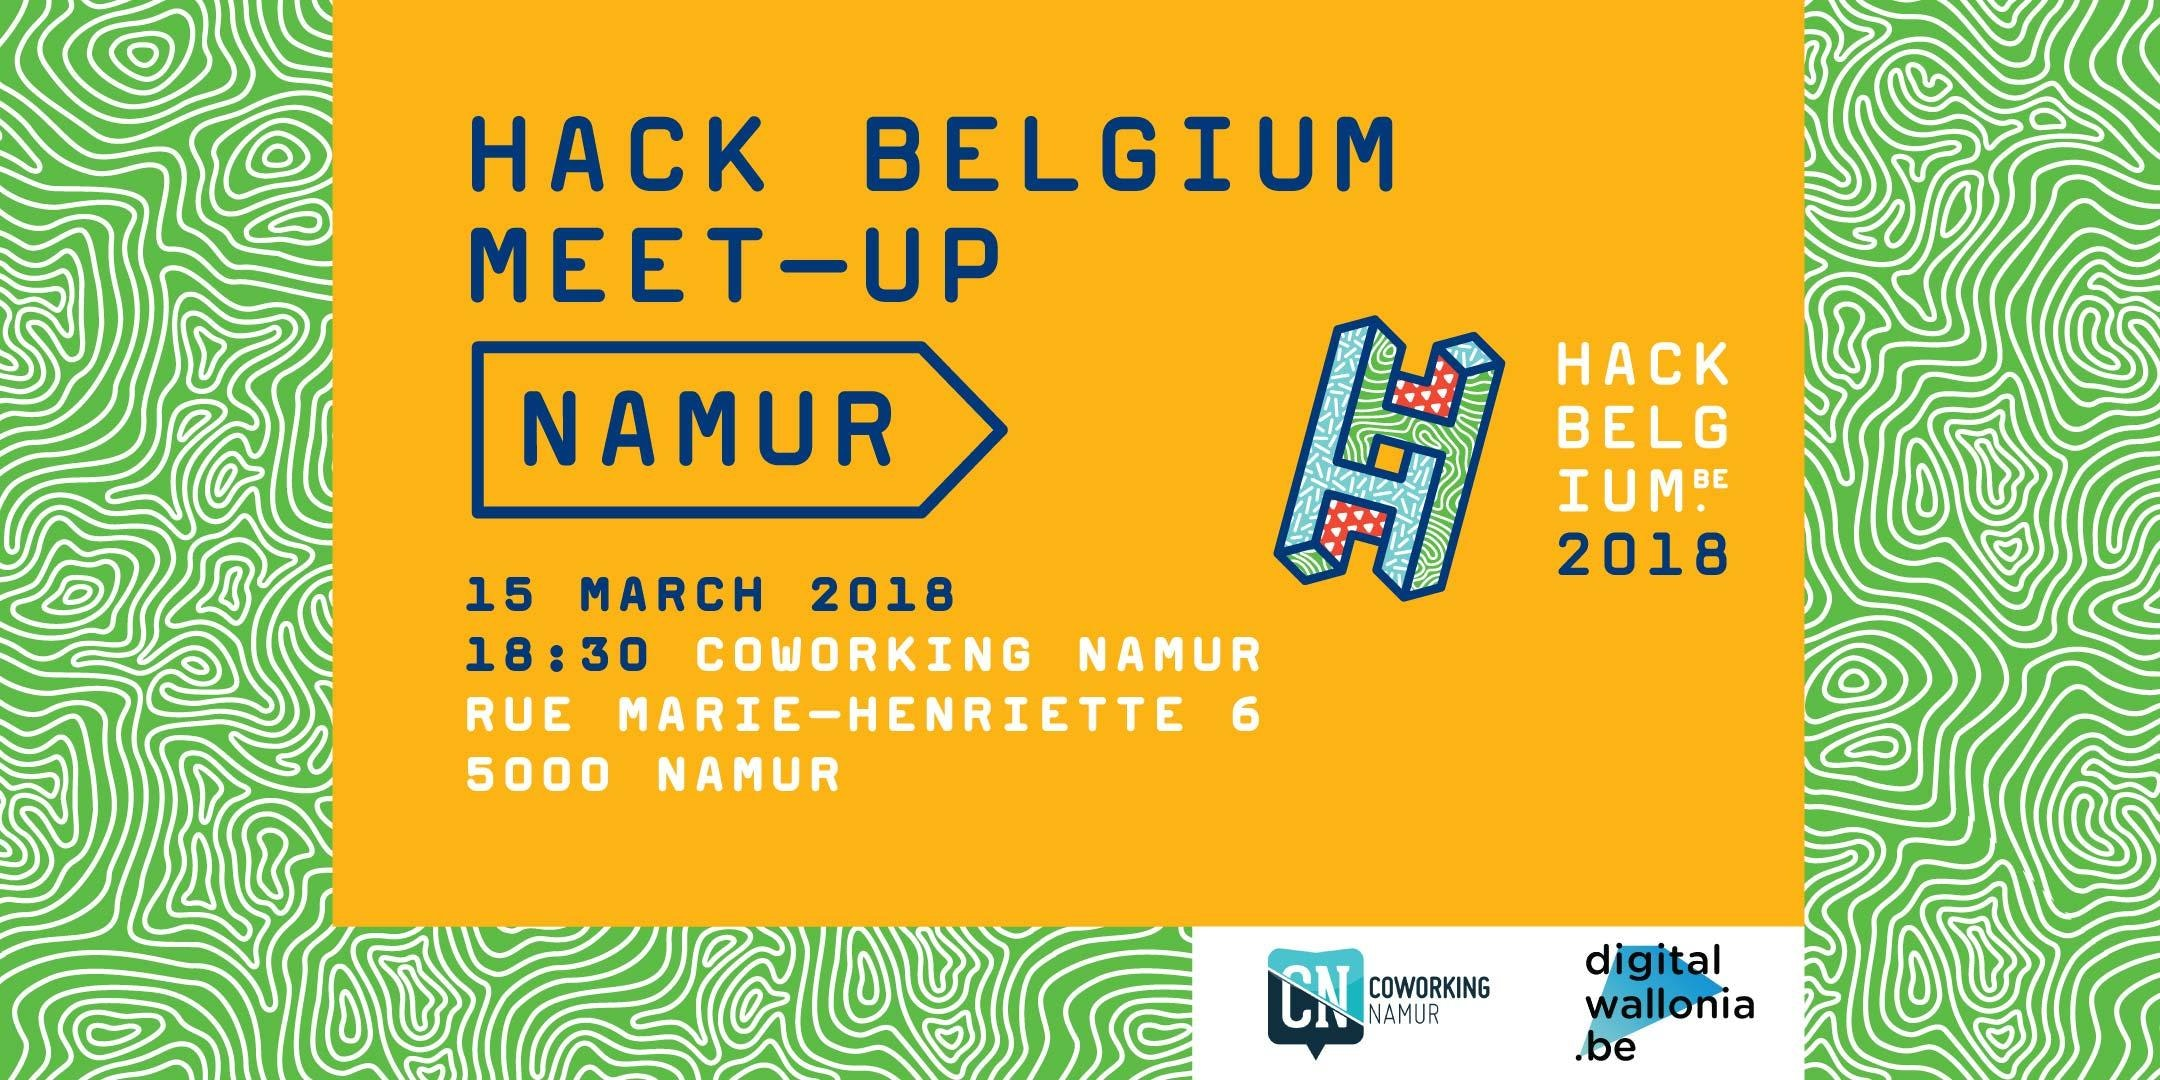 Hack Belgium meeting 2018 à Namur